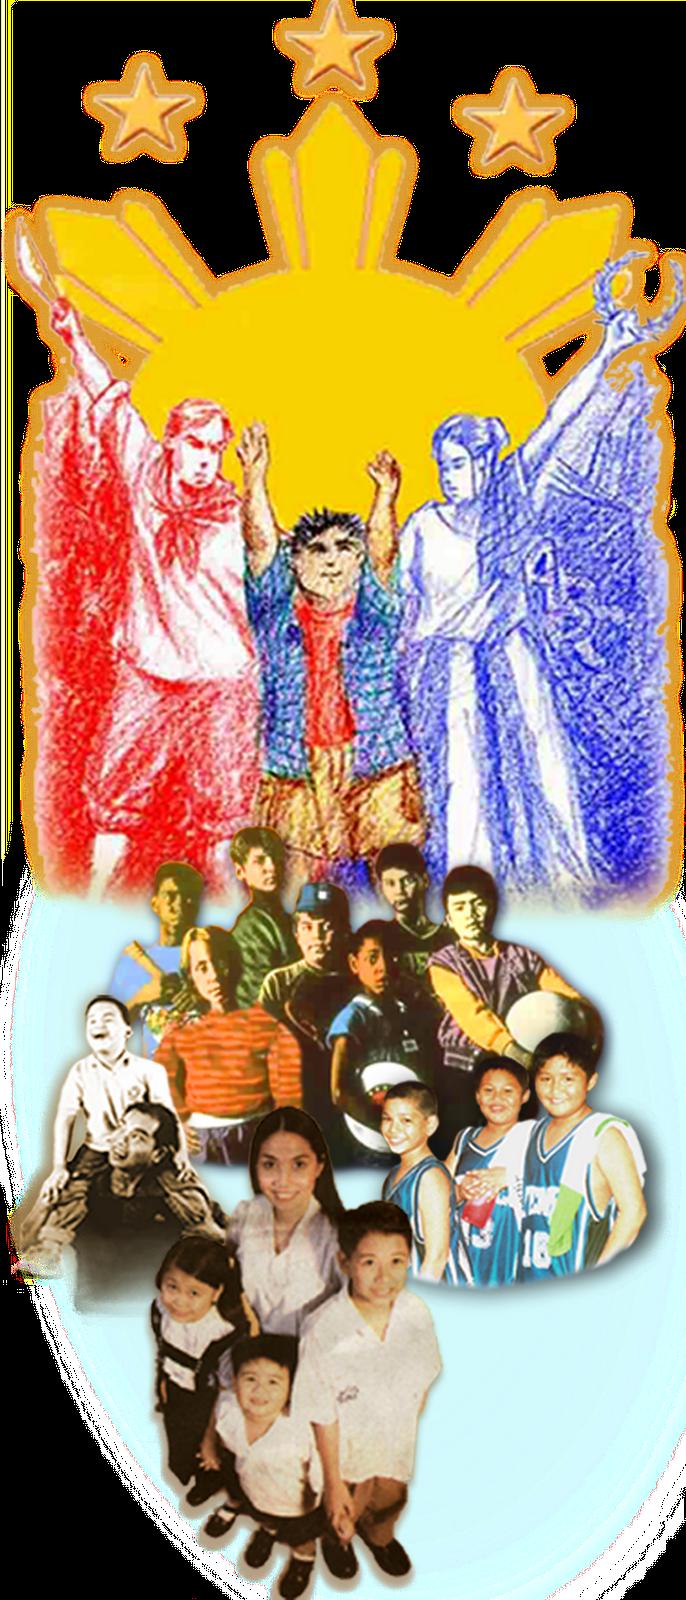 Iranian Revolution Ruhollah Khomeini